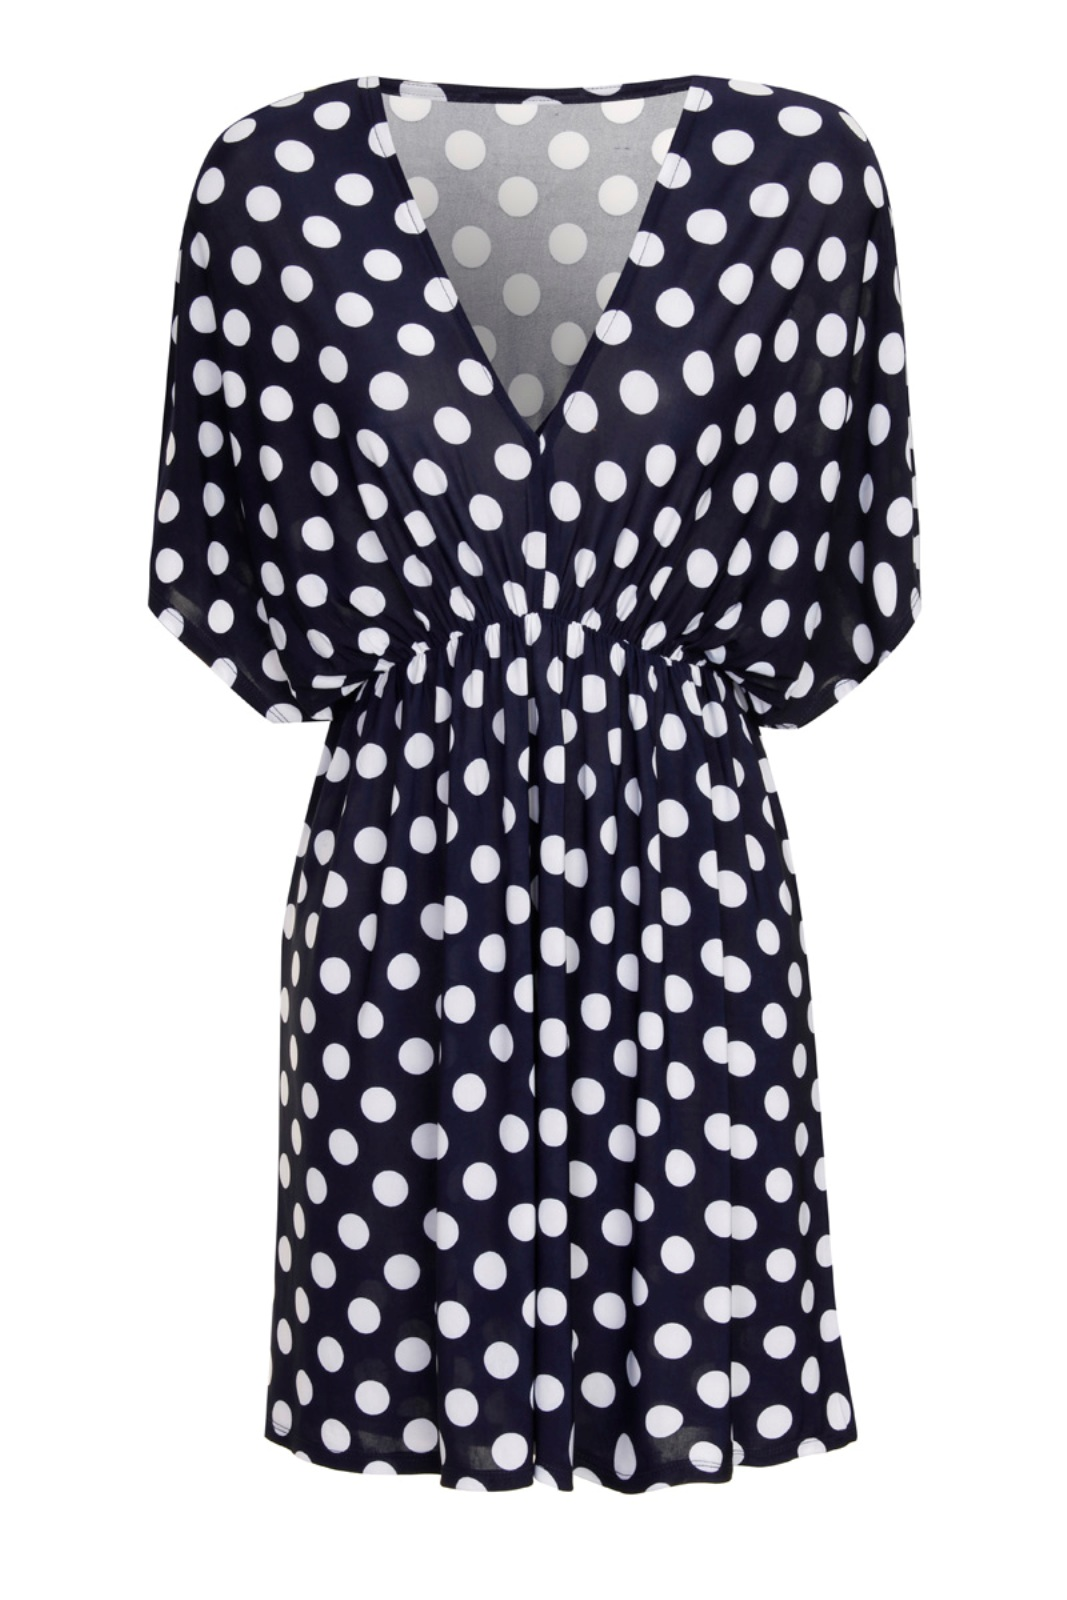 ed9b15b5b1e8 Womens Polka Dot V Neck Short Sleeved Blouse Stretch Summer Top ...